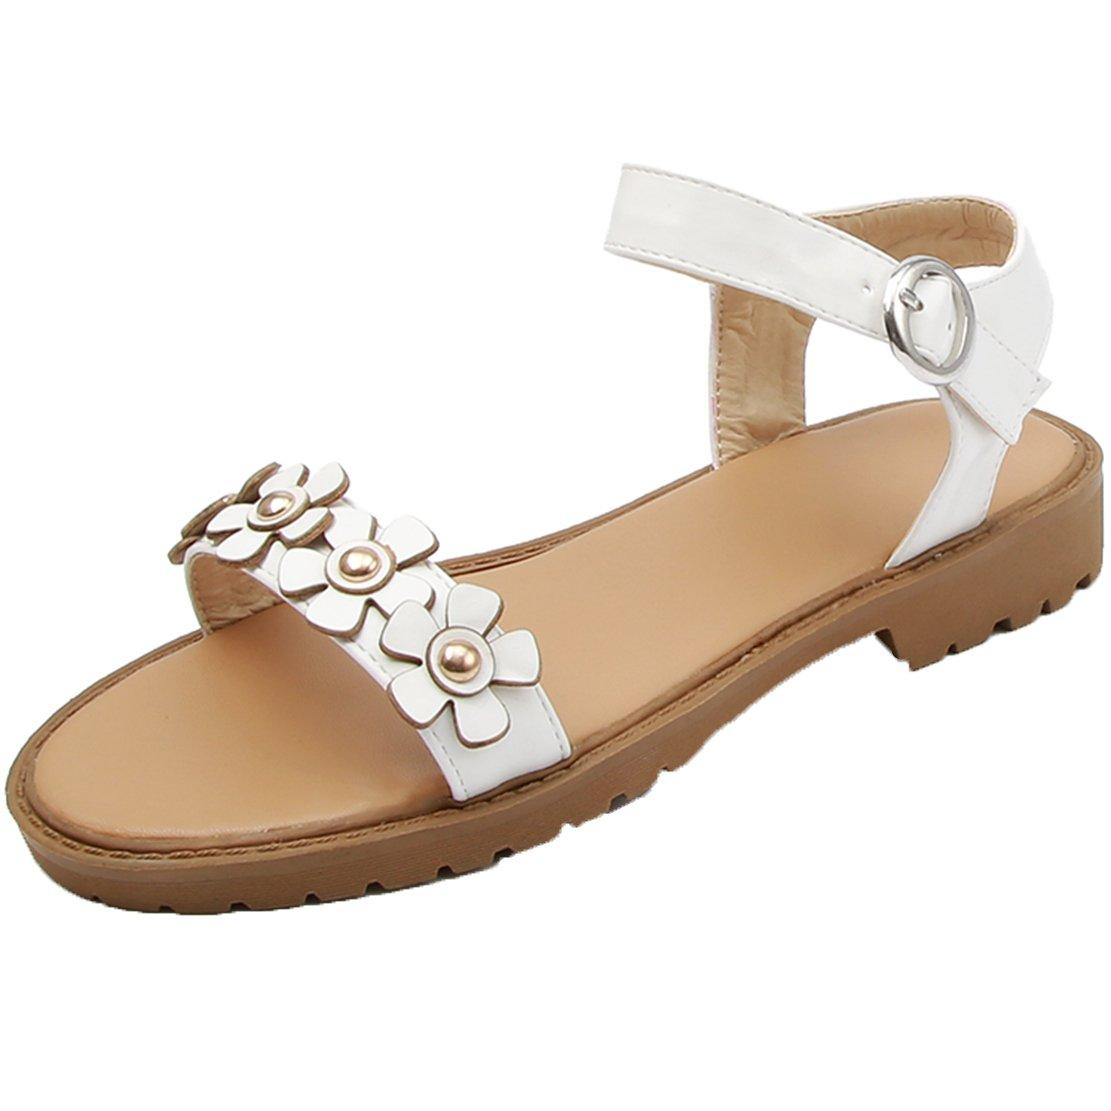 AIYOUMEI Damen Flache Sandalen mit Blumen Sandaletten Riemchen Flach Bohemia Schuhe Sommer Bequem  37 EU|Wei?